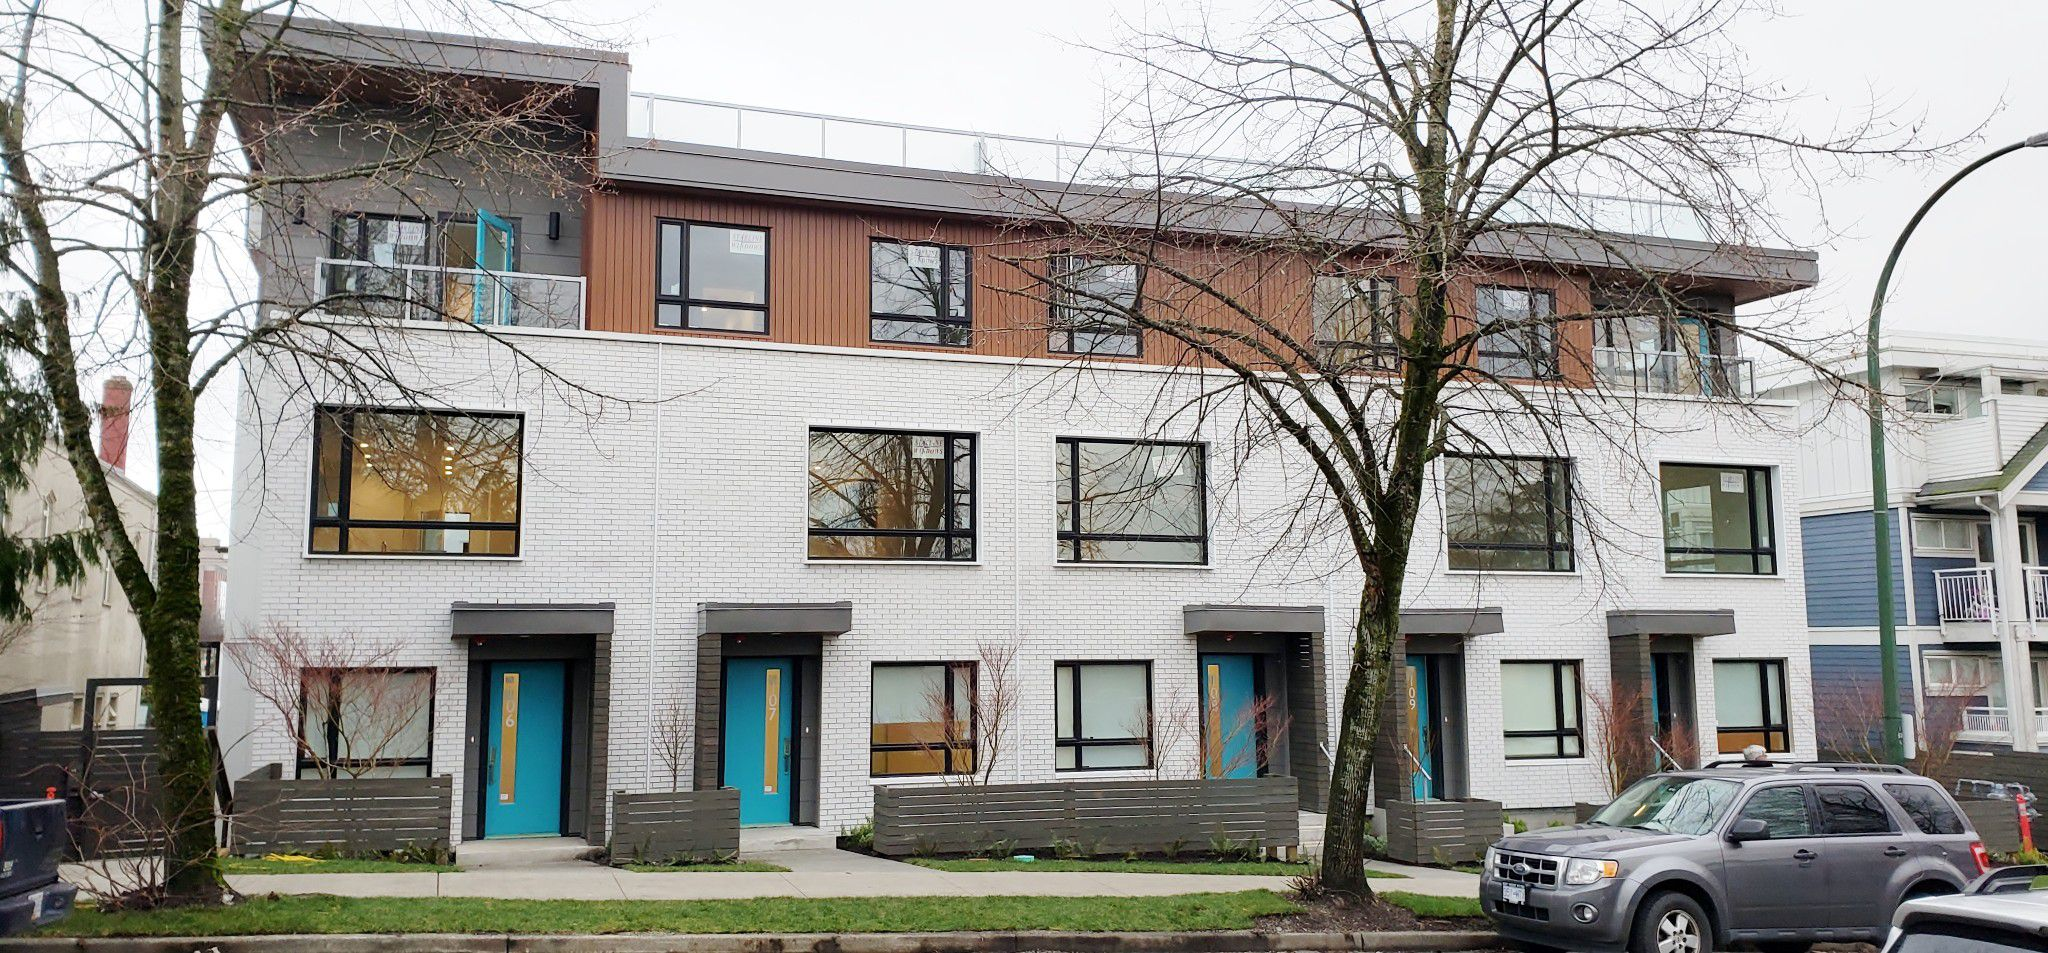 Main Photo: 311 E 16 Avenue in Vancouver: Main Street Condo for rent ()  : MLS®# R2342897